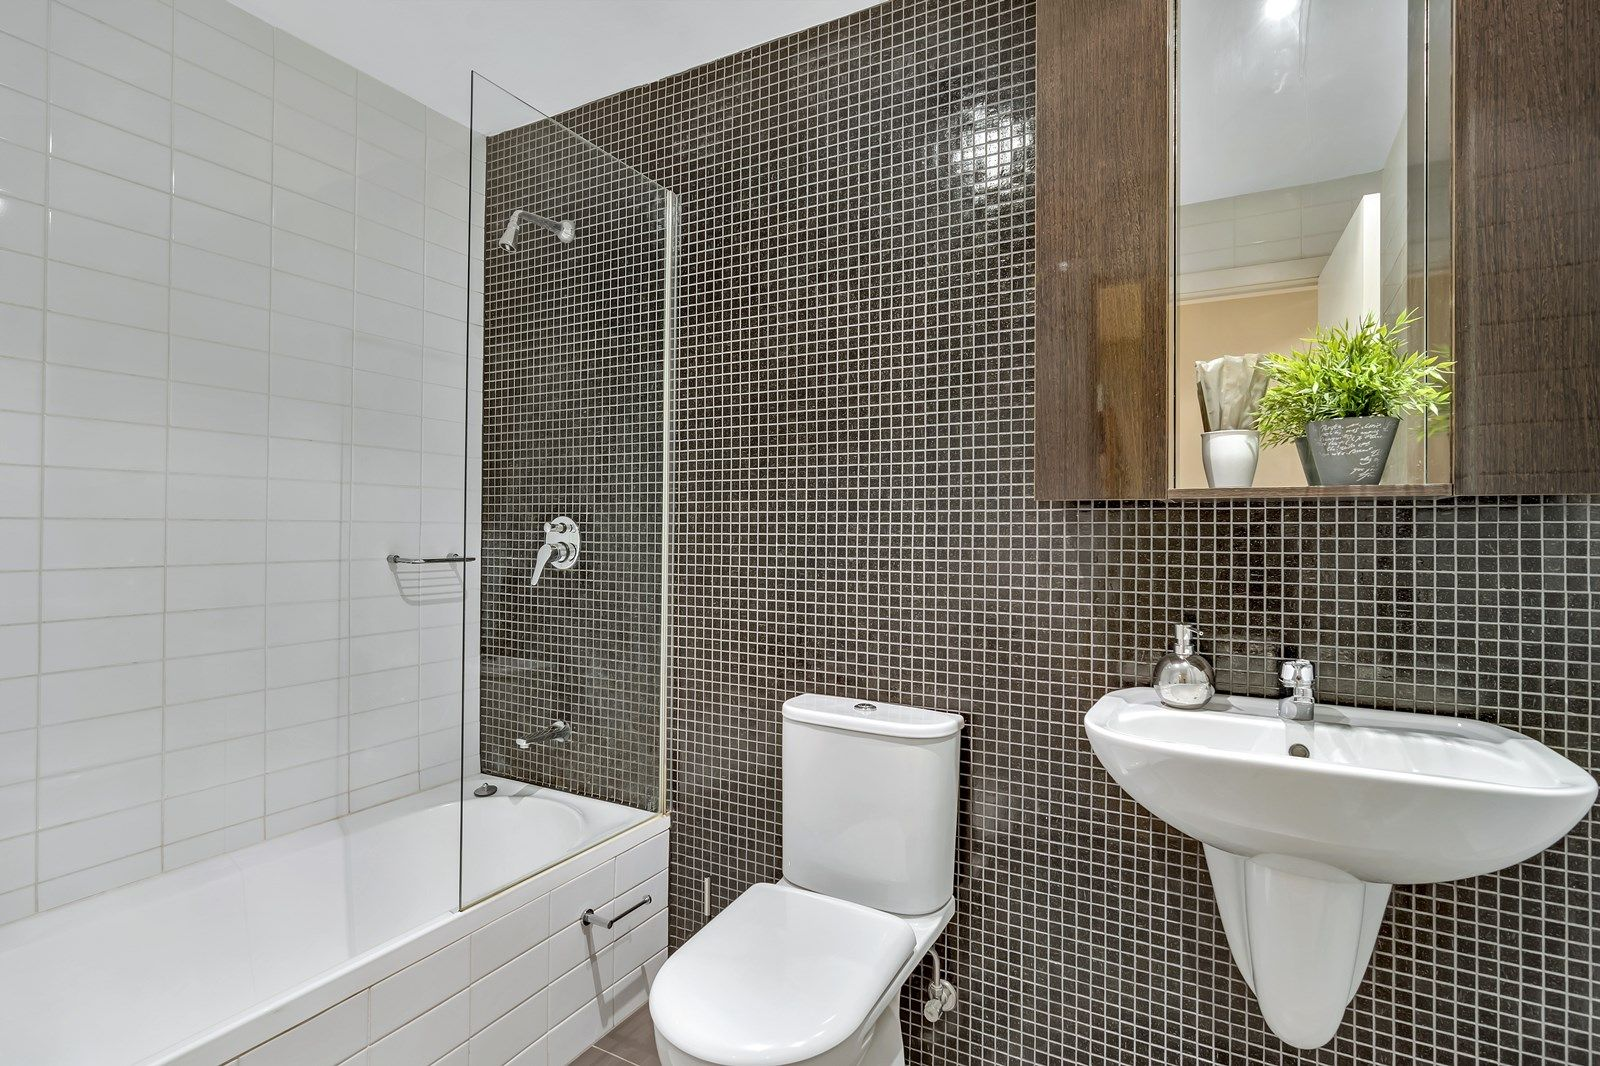 14/1-5 Albany Street, St Leonards NSW 2065, Image 2